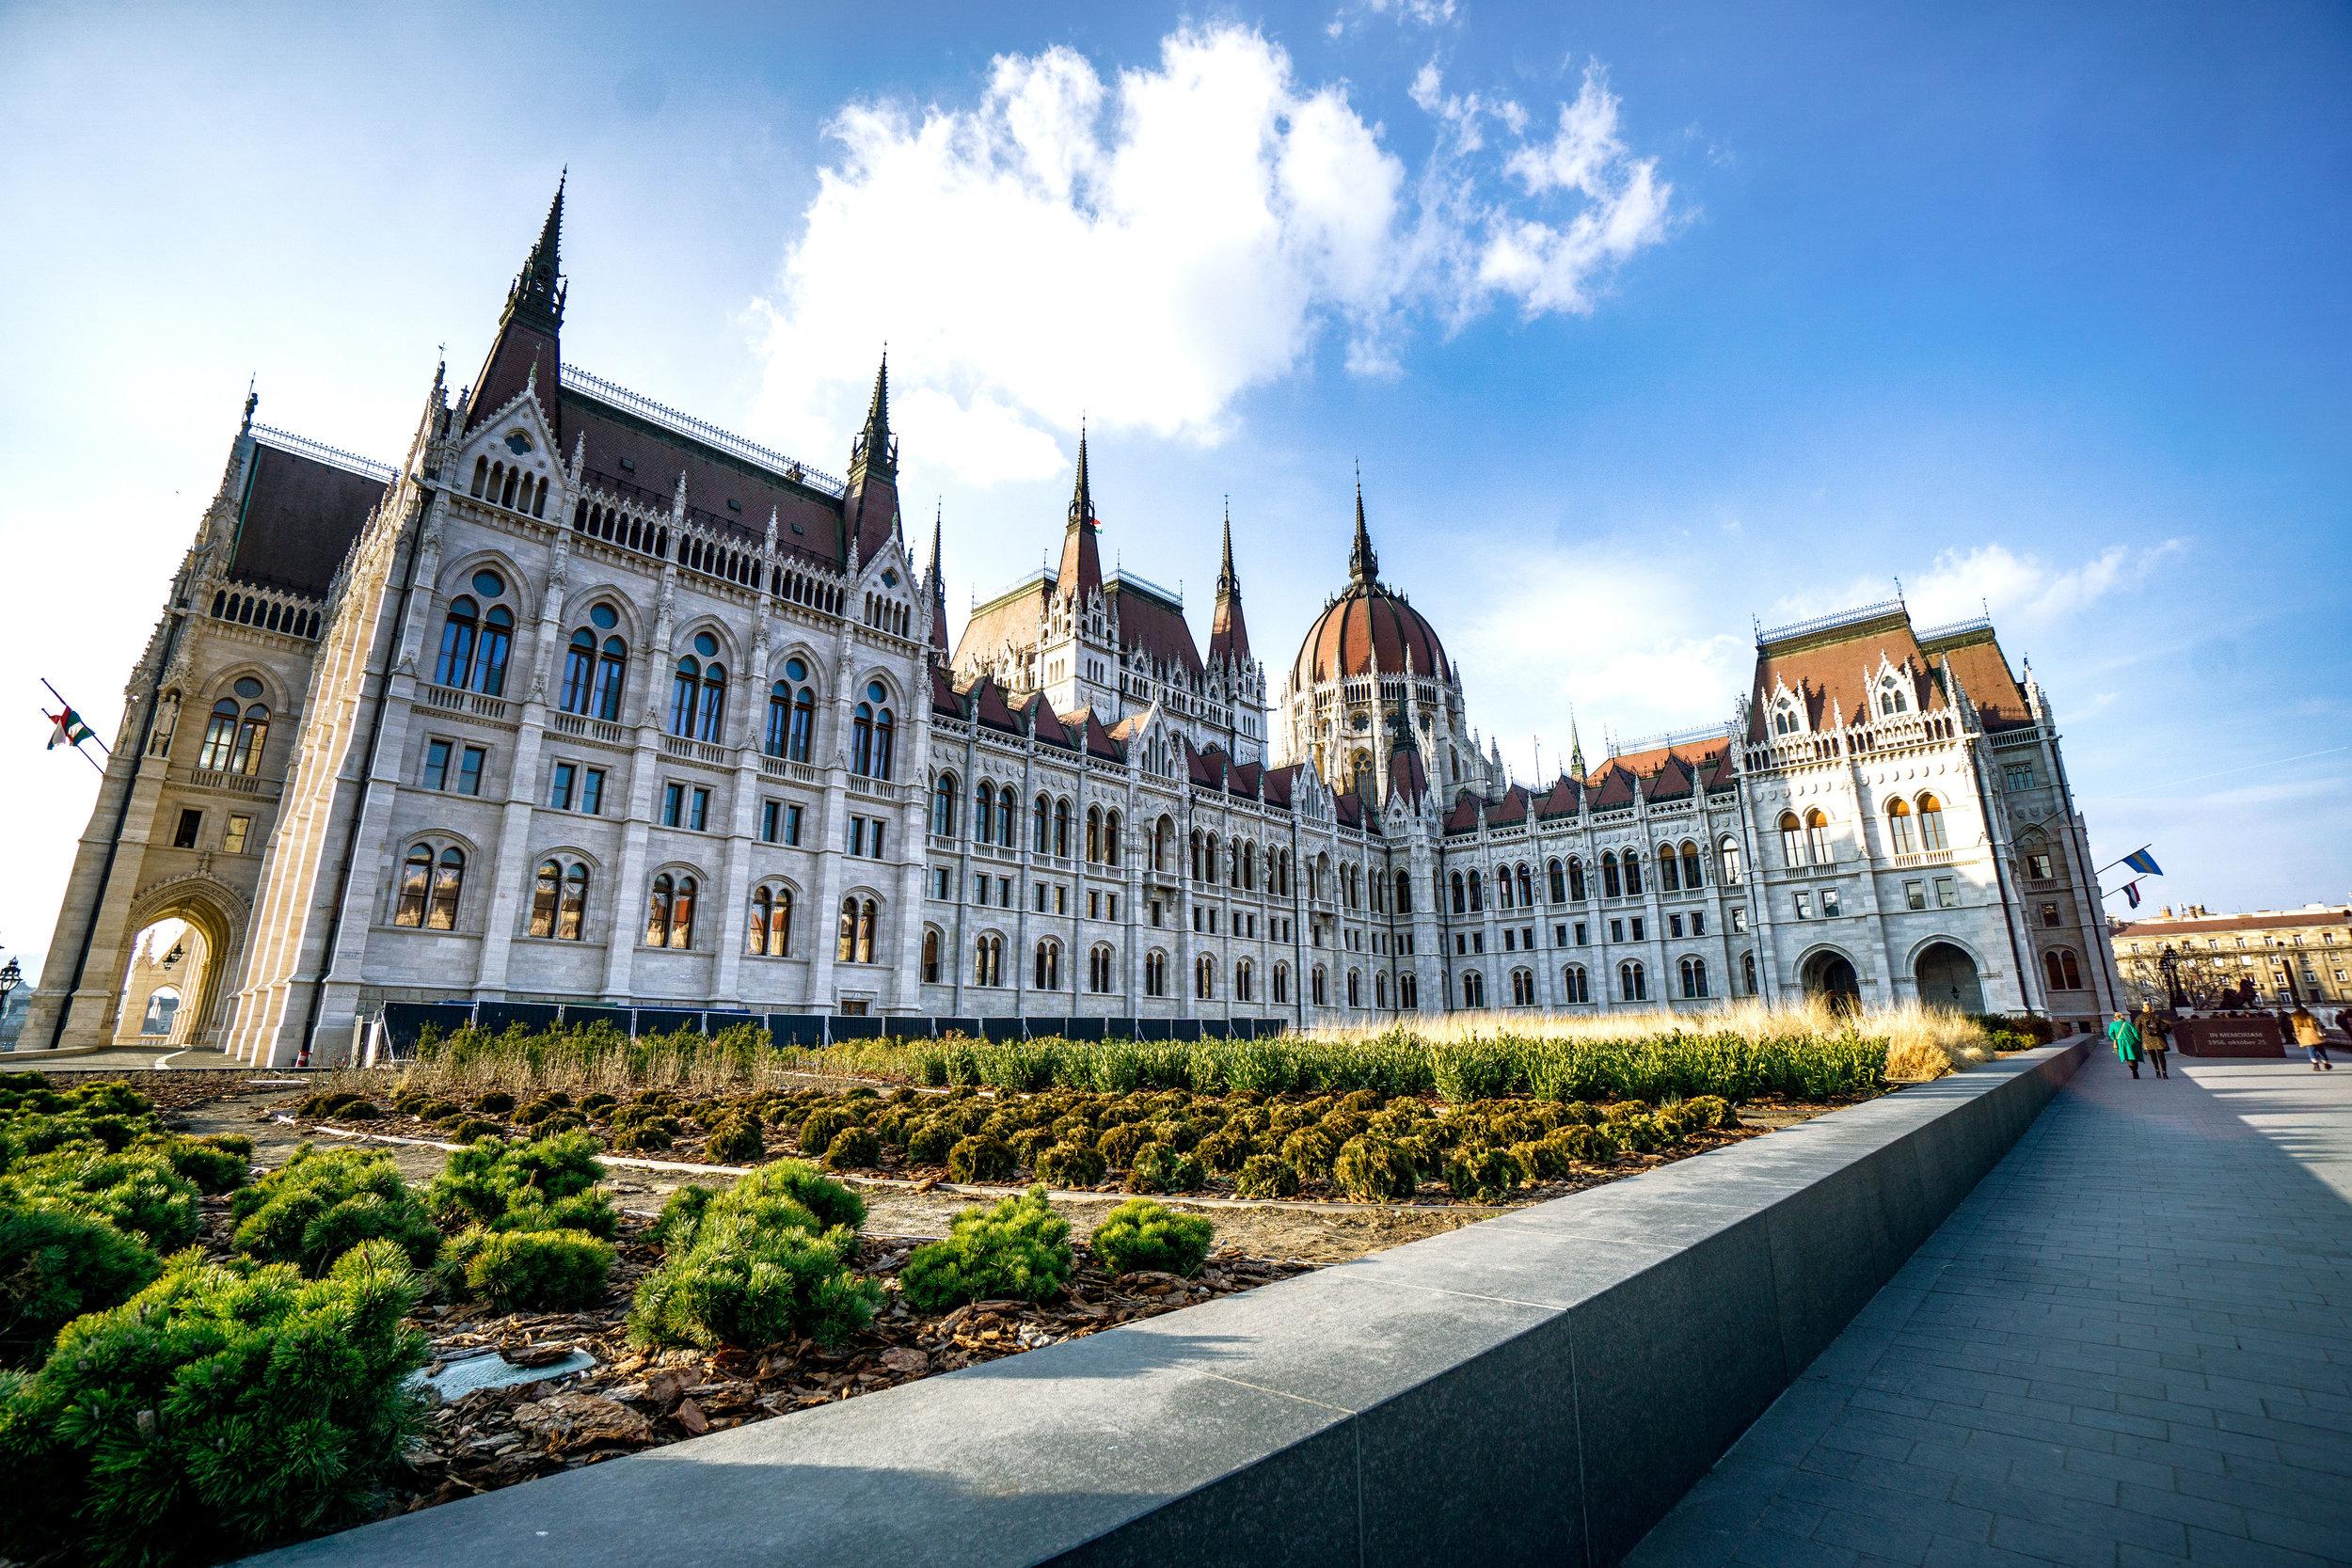 budapest_parliament_building_vickygood_travel_photography5sm.jpg